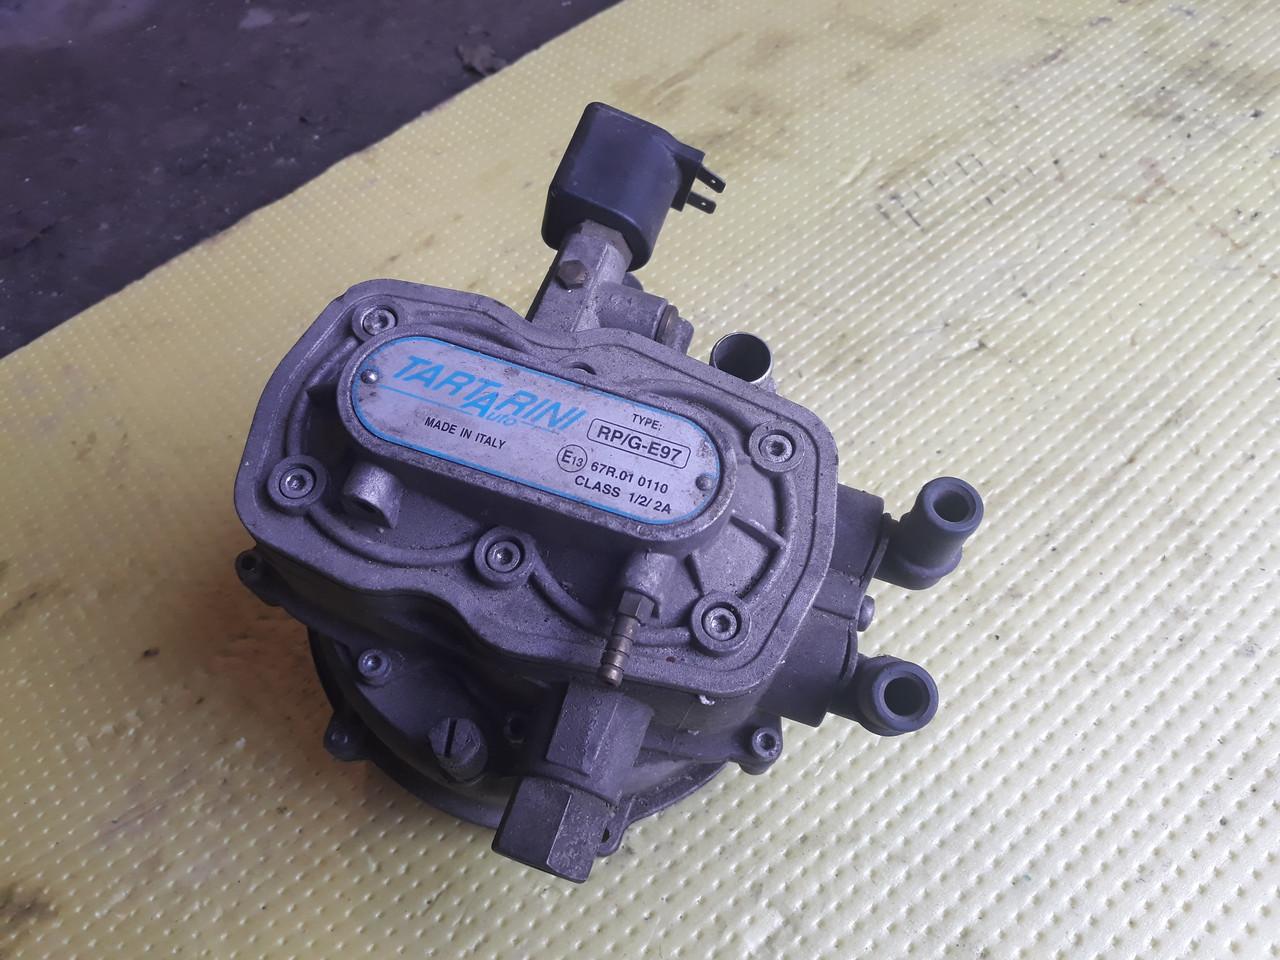 Газовый редуктор tartarini RP\G-E97 RP/G 67R-01 0110